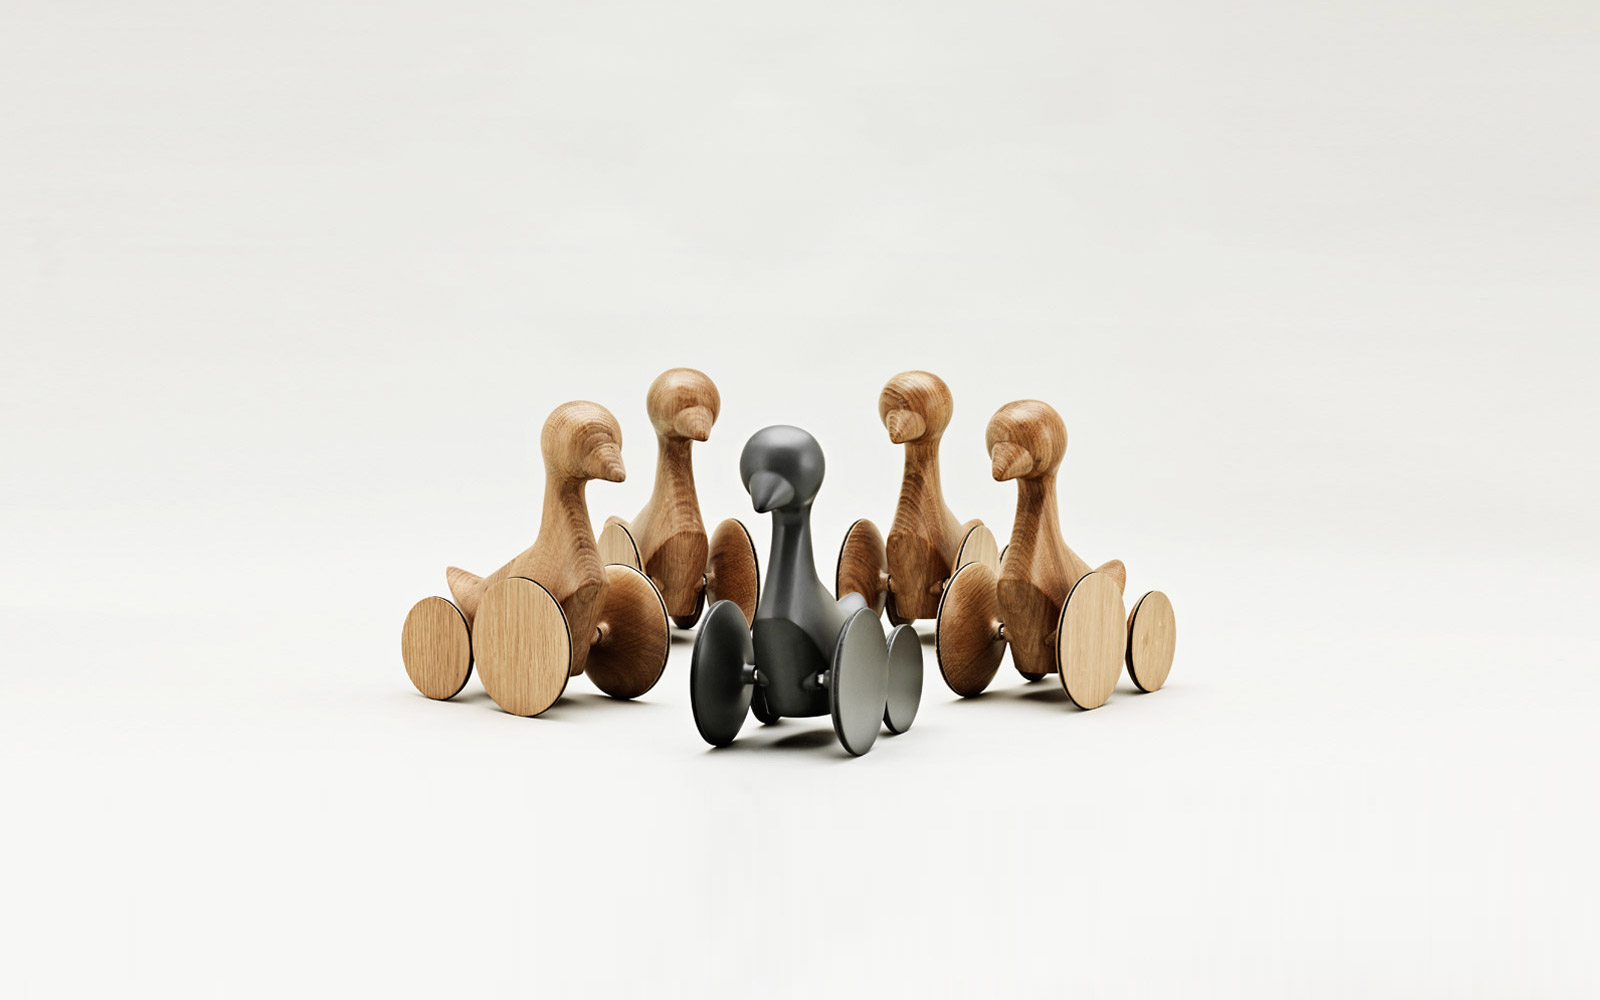 Ducky Wooden Figure | alvaluz.com